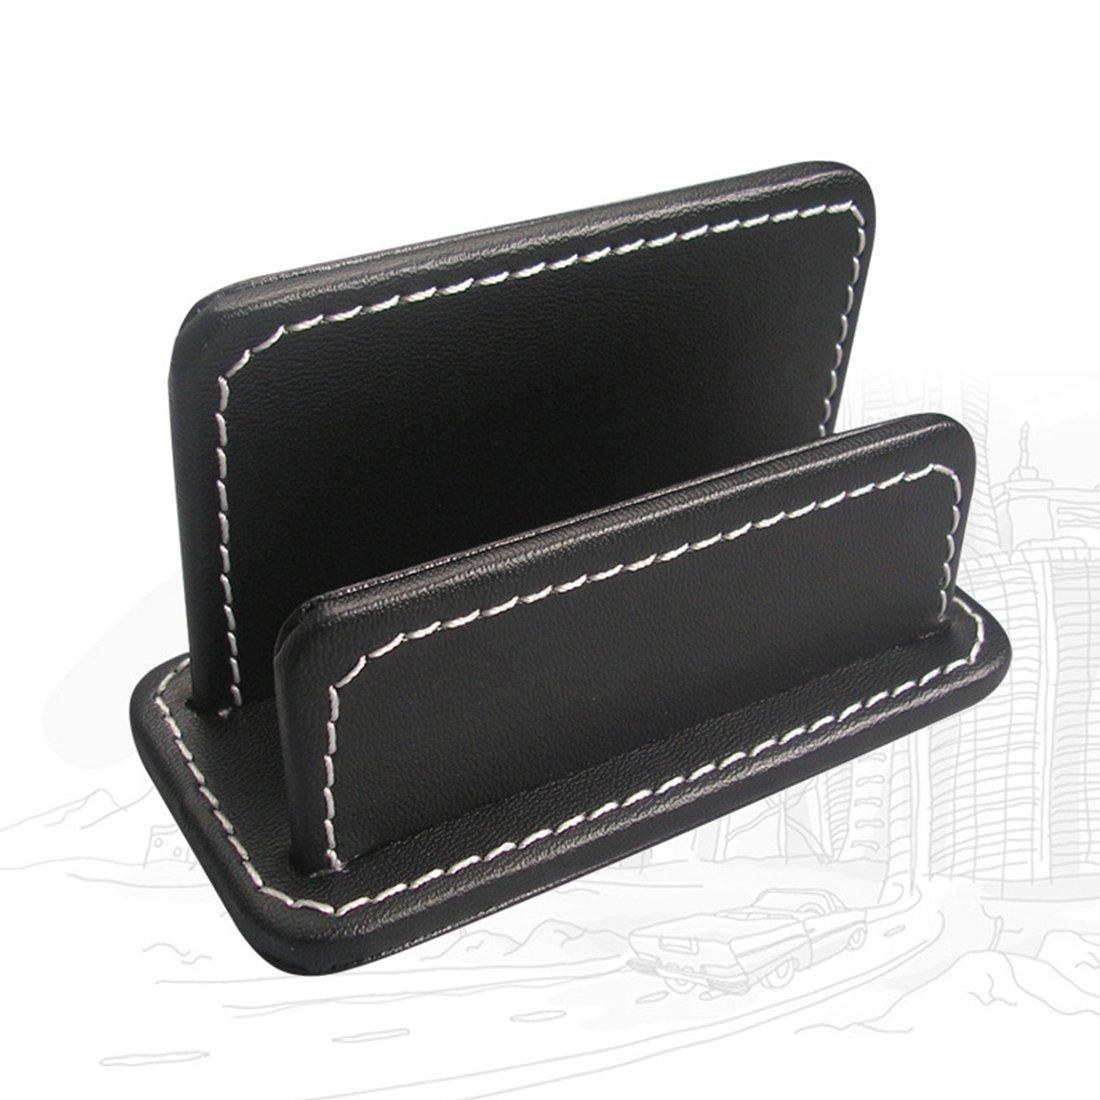 Name Cards Holder, Zubita Creative Design PU Leather Business Name Card Holder Stand Notes Container Desktop Organizer ( Black )